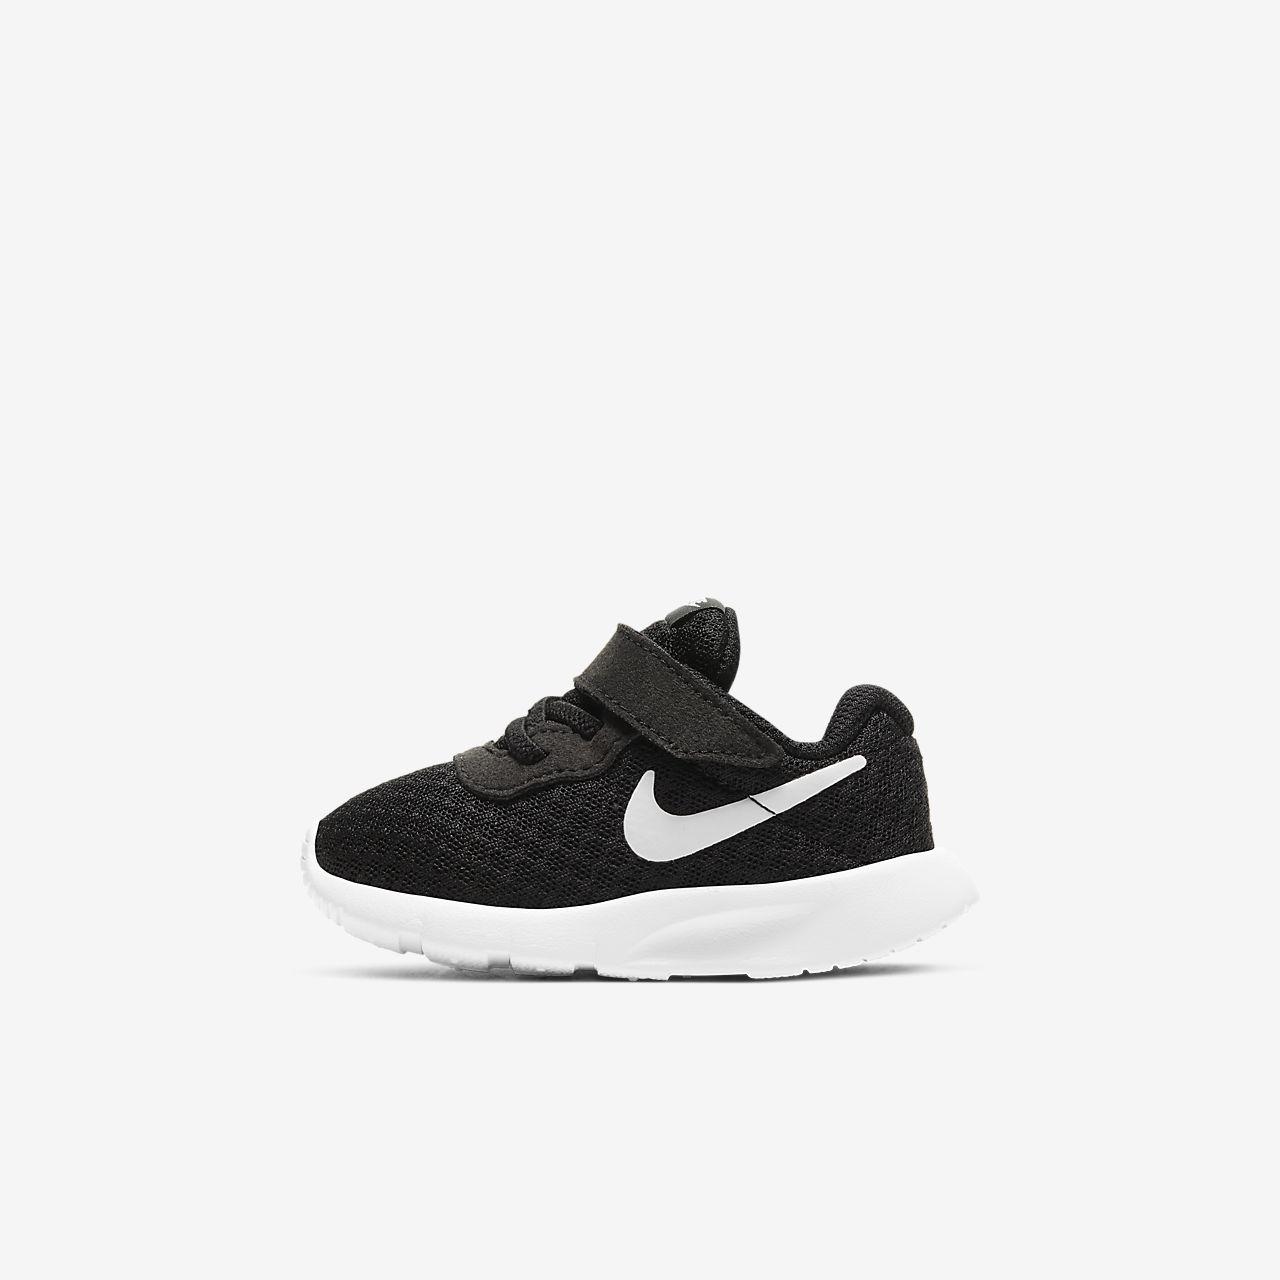 best cheap 38c04 92001 ... Nike Tanjun-sko for babysmåbarn (17–27)